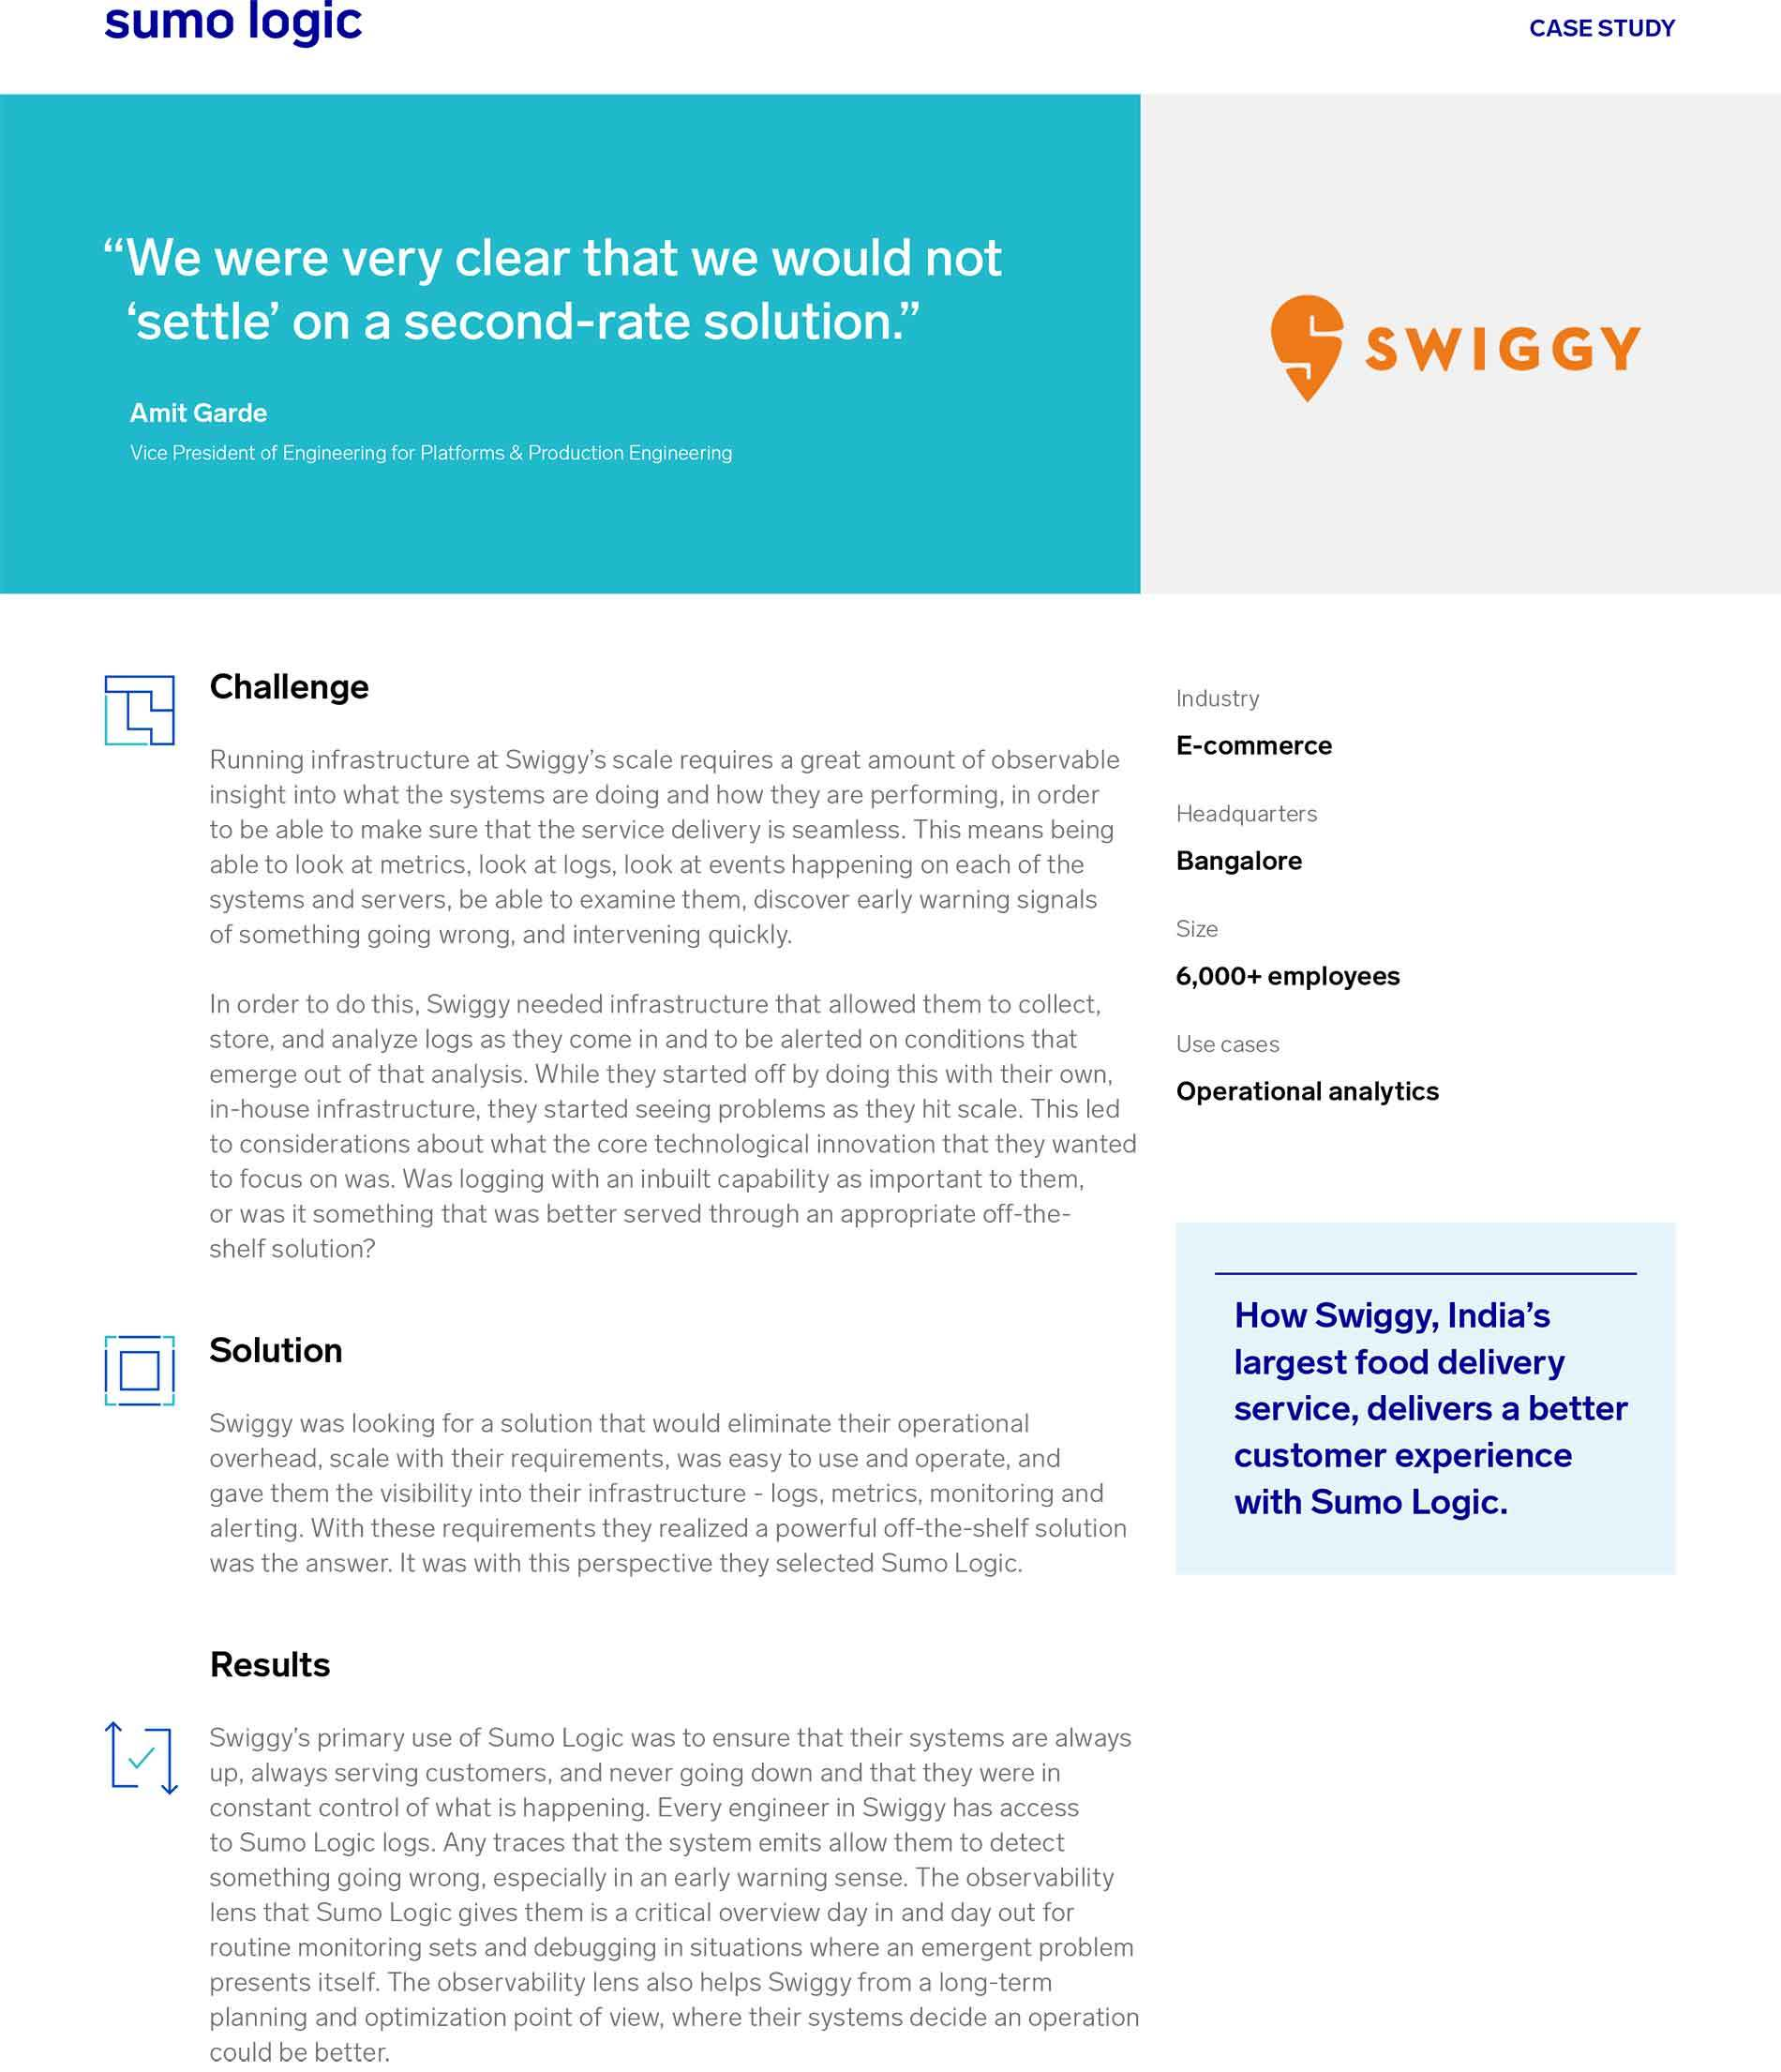 Swiggy Case Study